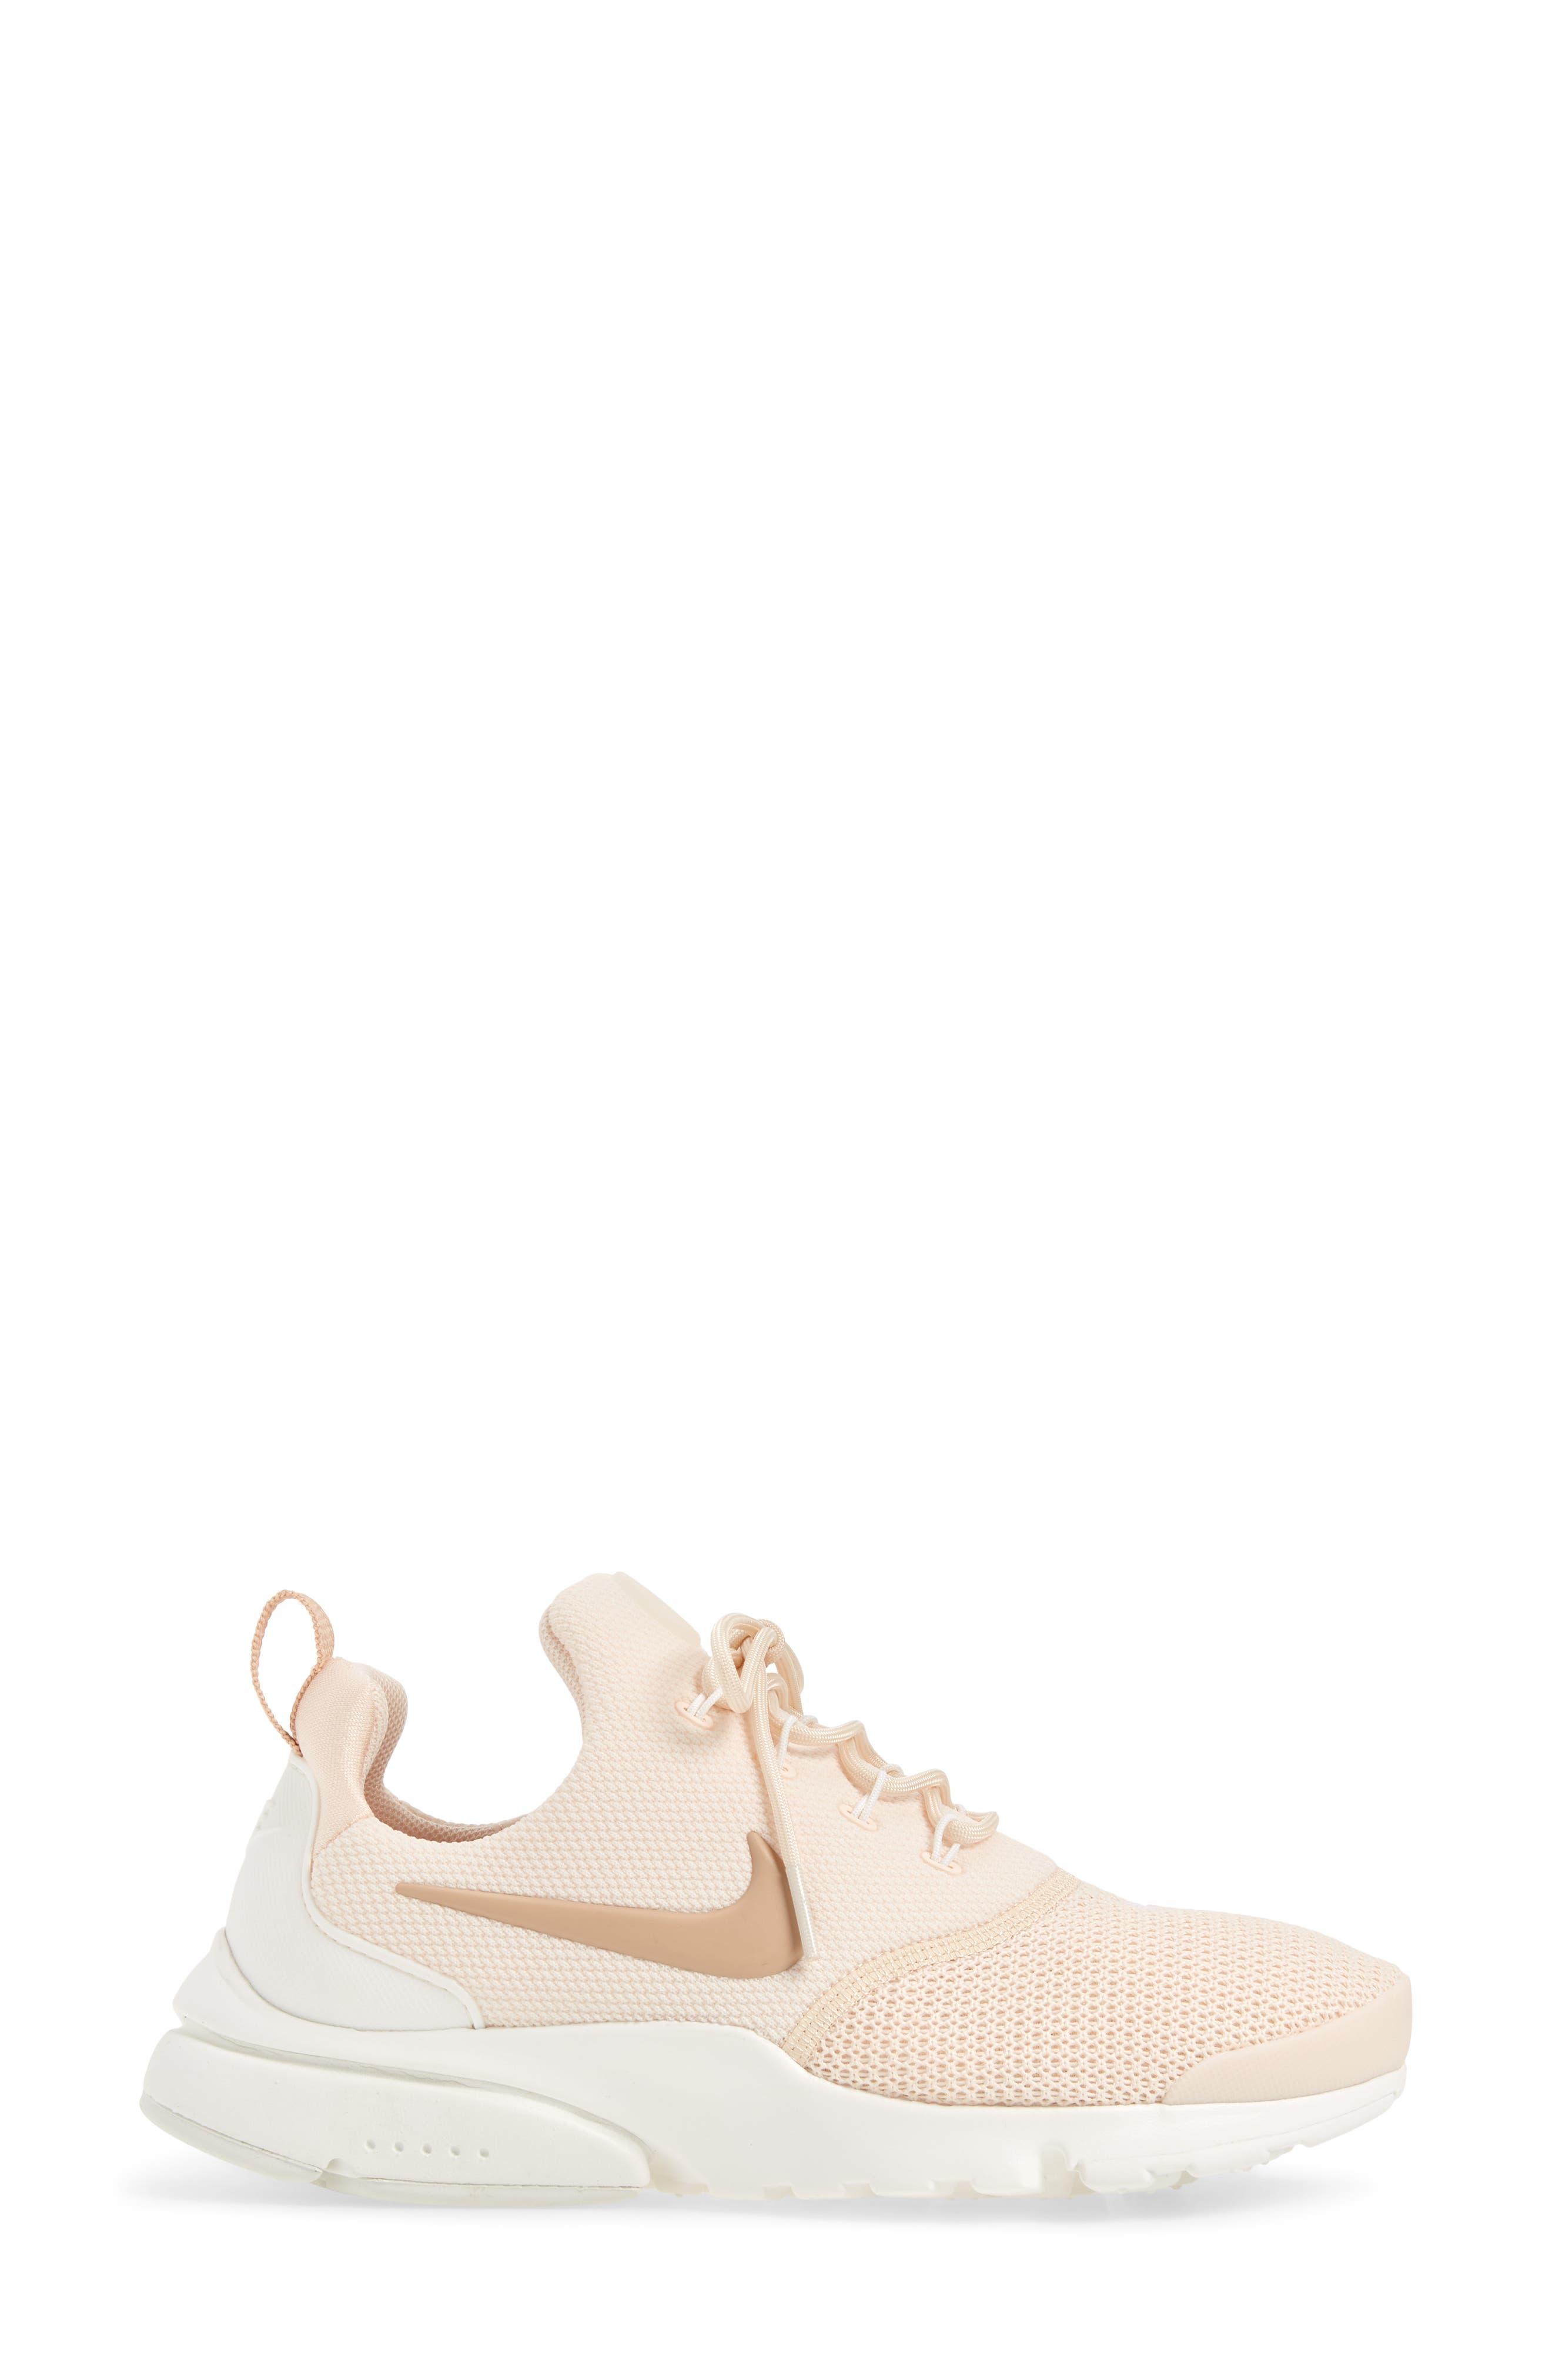 Presto Fly Sneaker,                             Alternate thumbnail 6, color,                             Guava Ice/ Beige/ Summit White